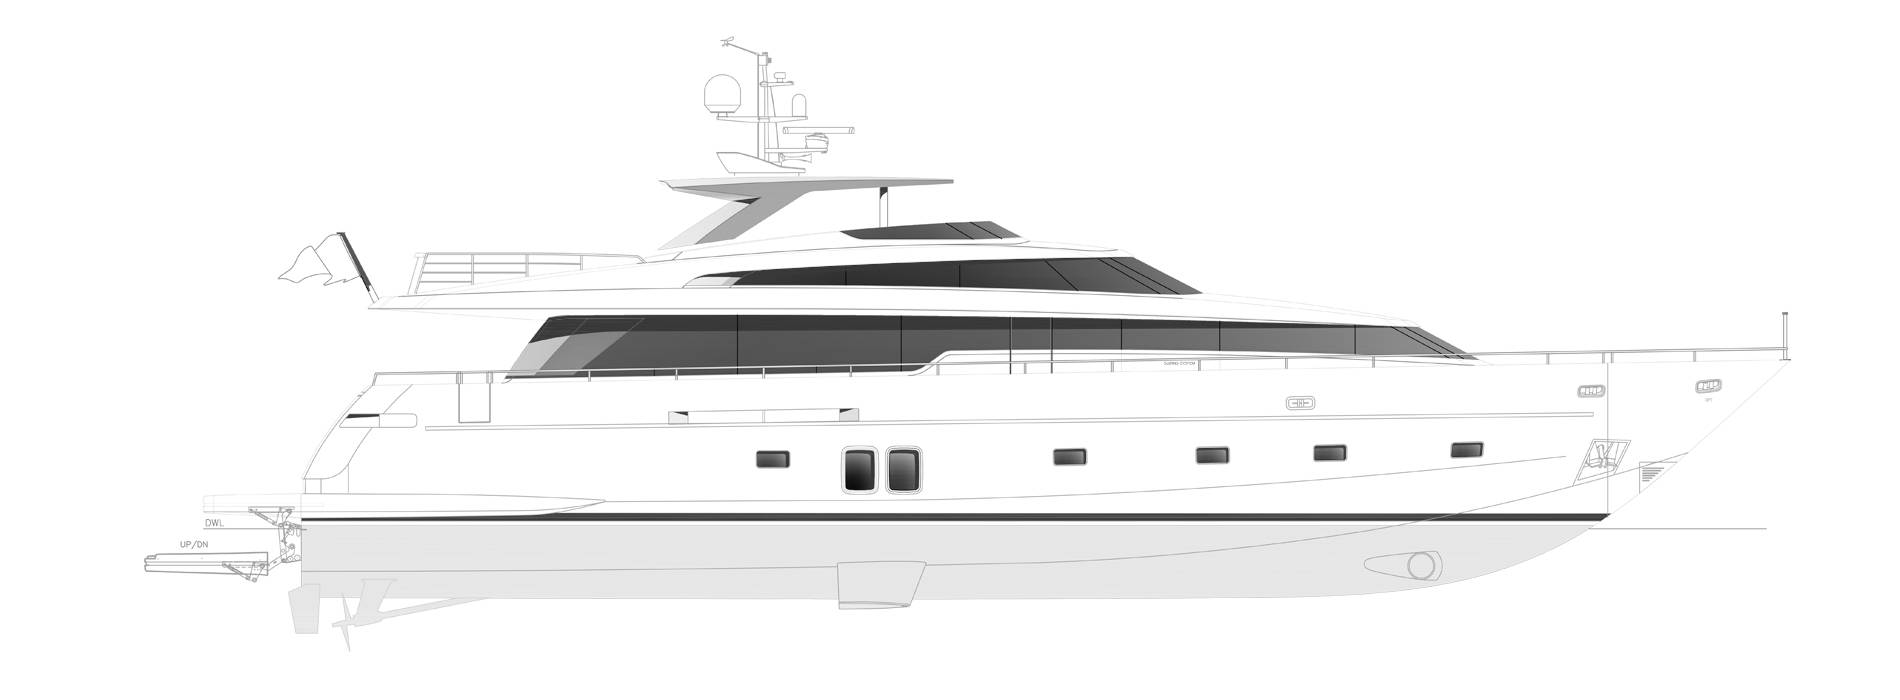 Sanlorenzo Yachts SL96-631 Profile